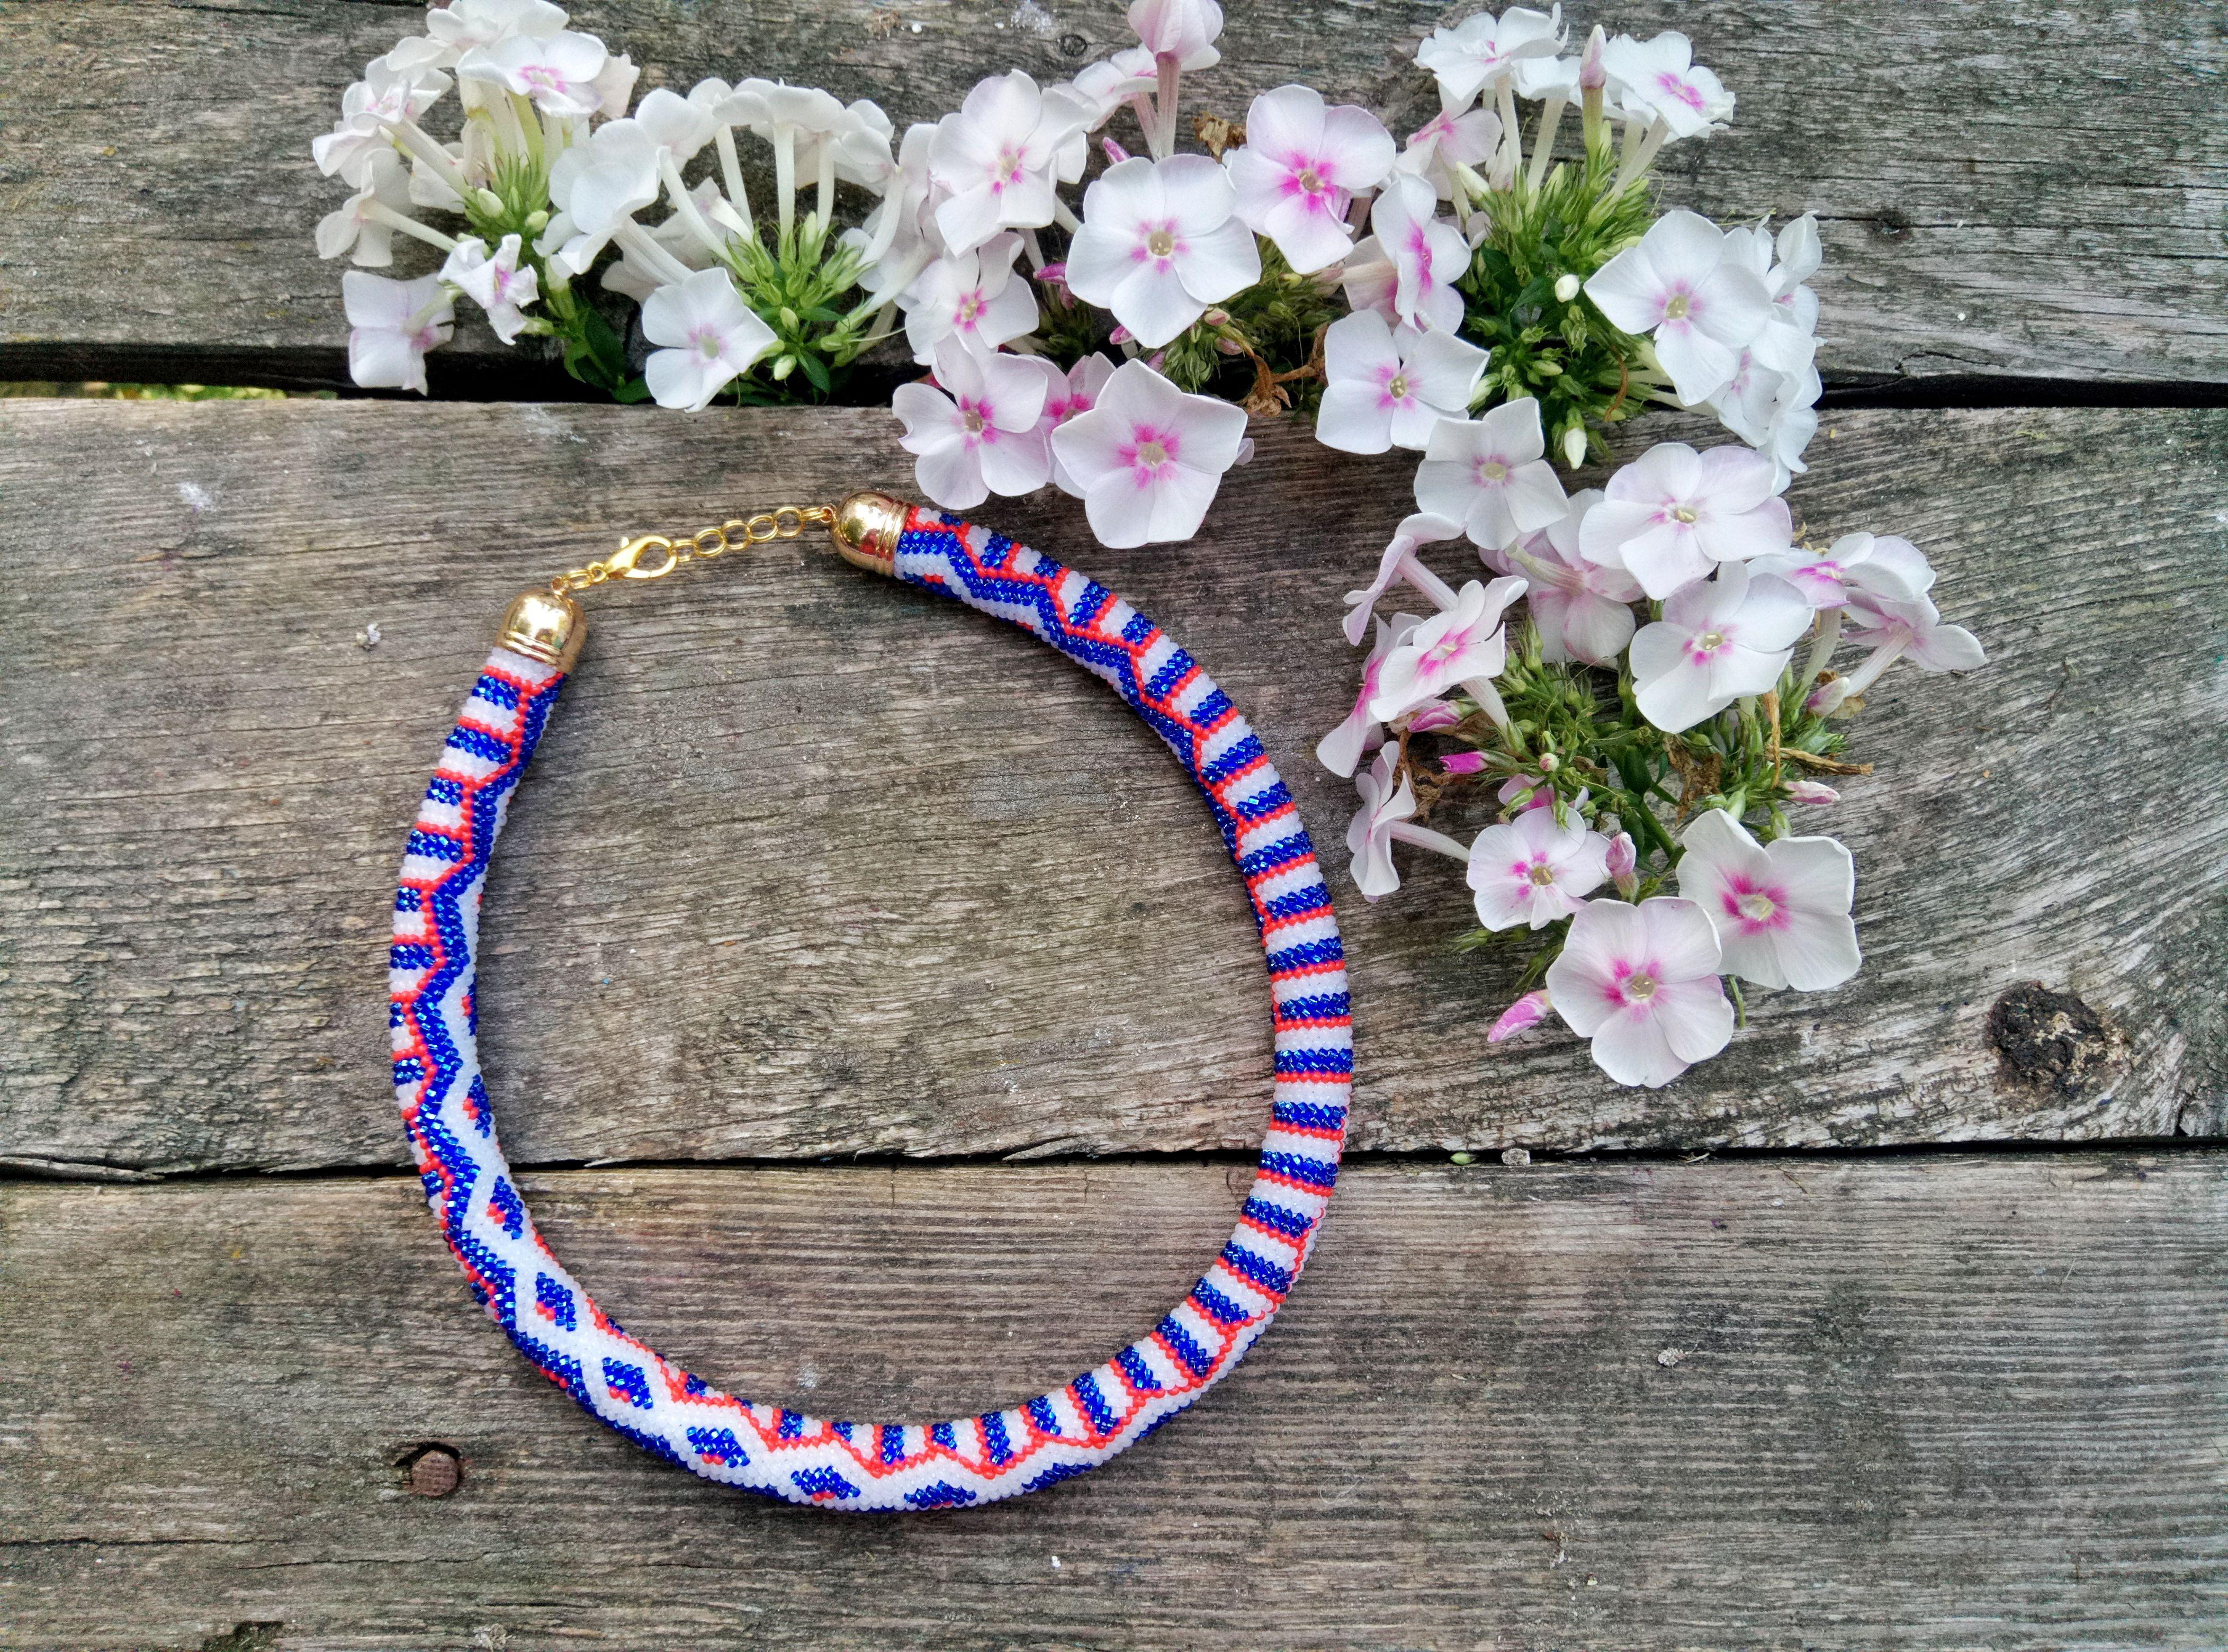 колье бусы бижутерия ожерелье жгут бисер подарок